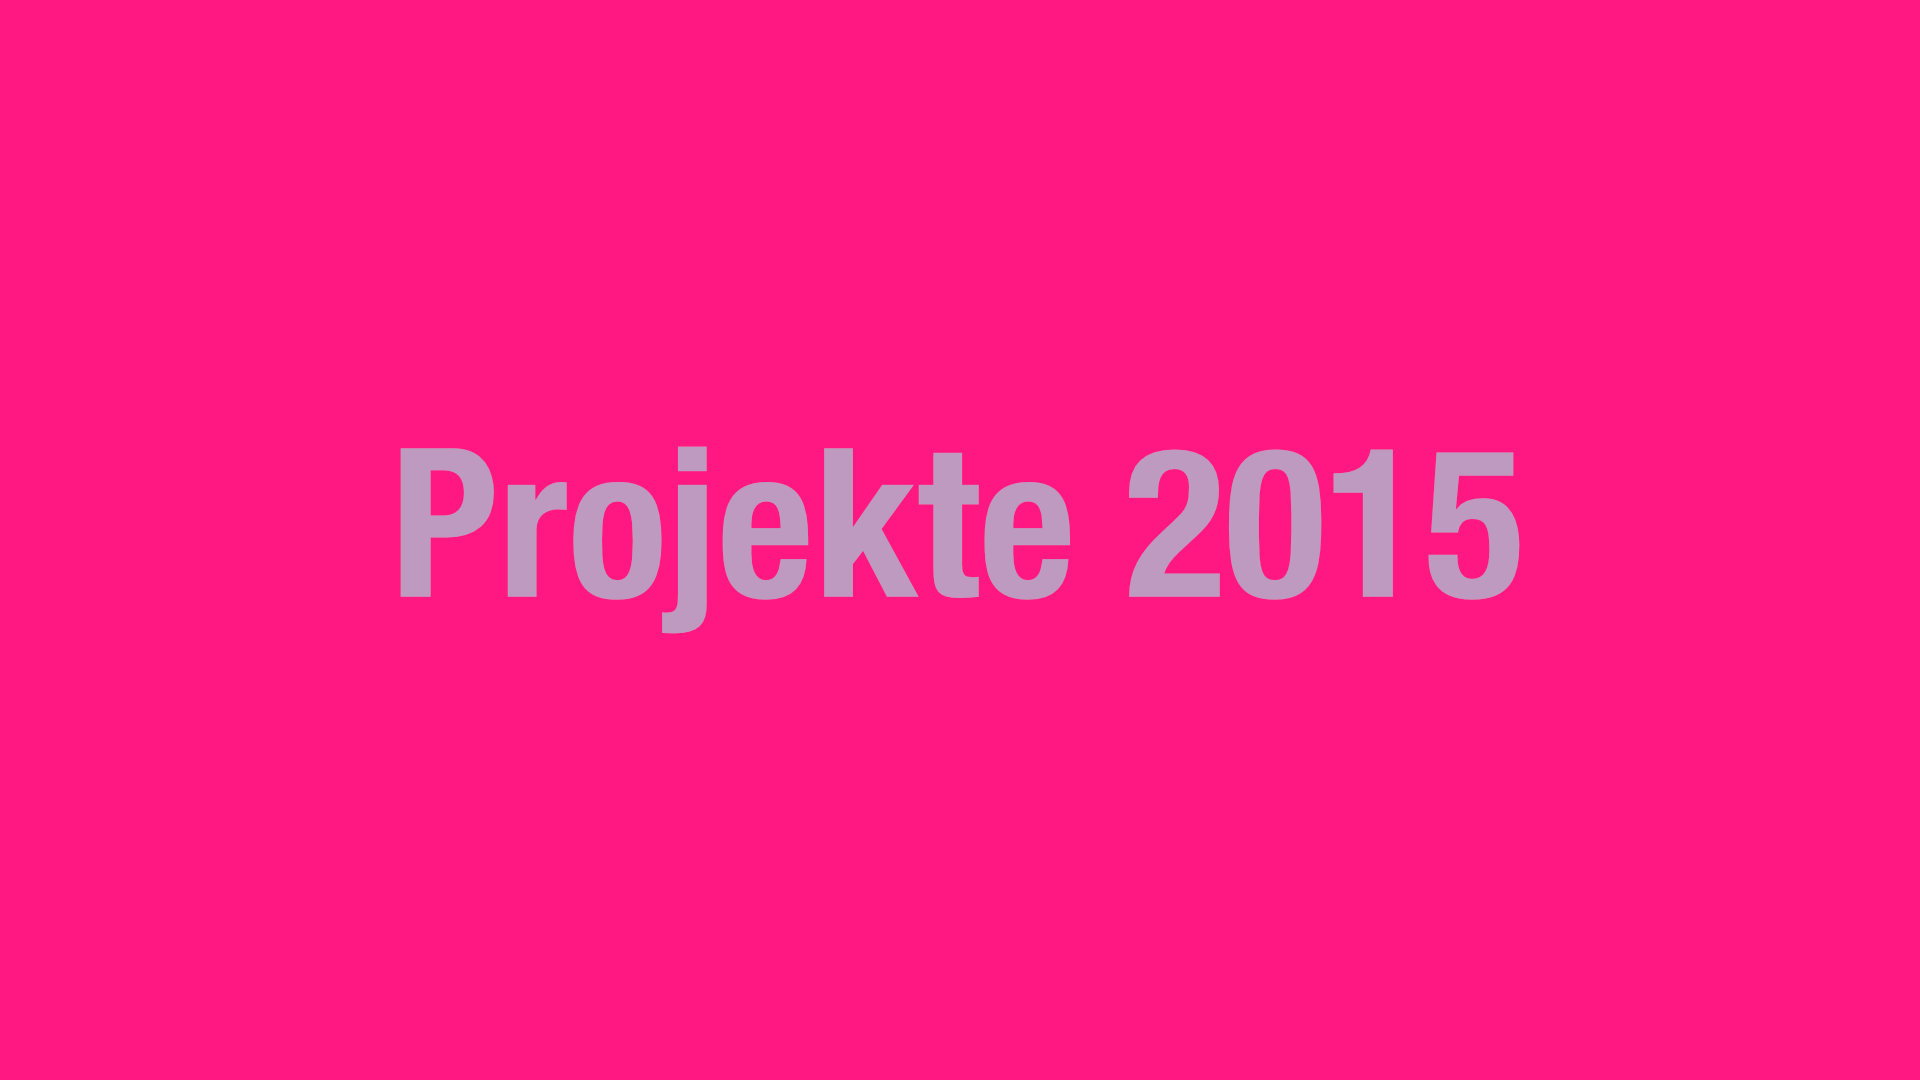 Projekte 2015